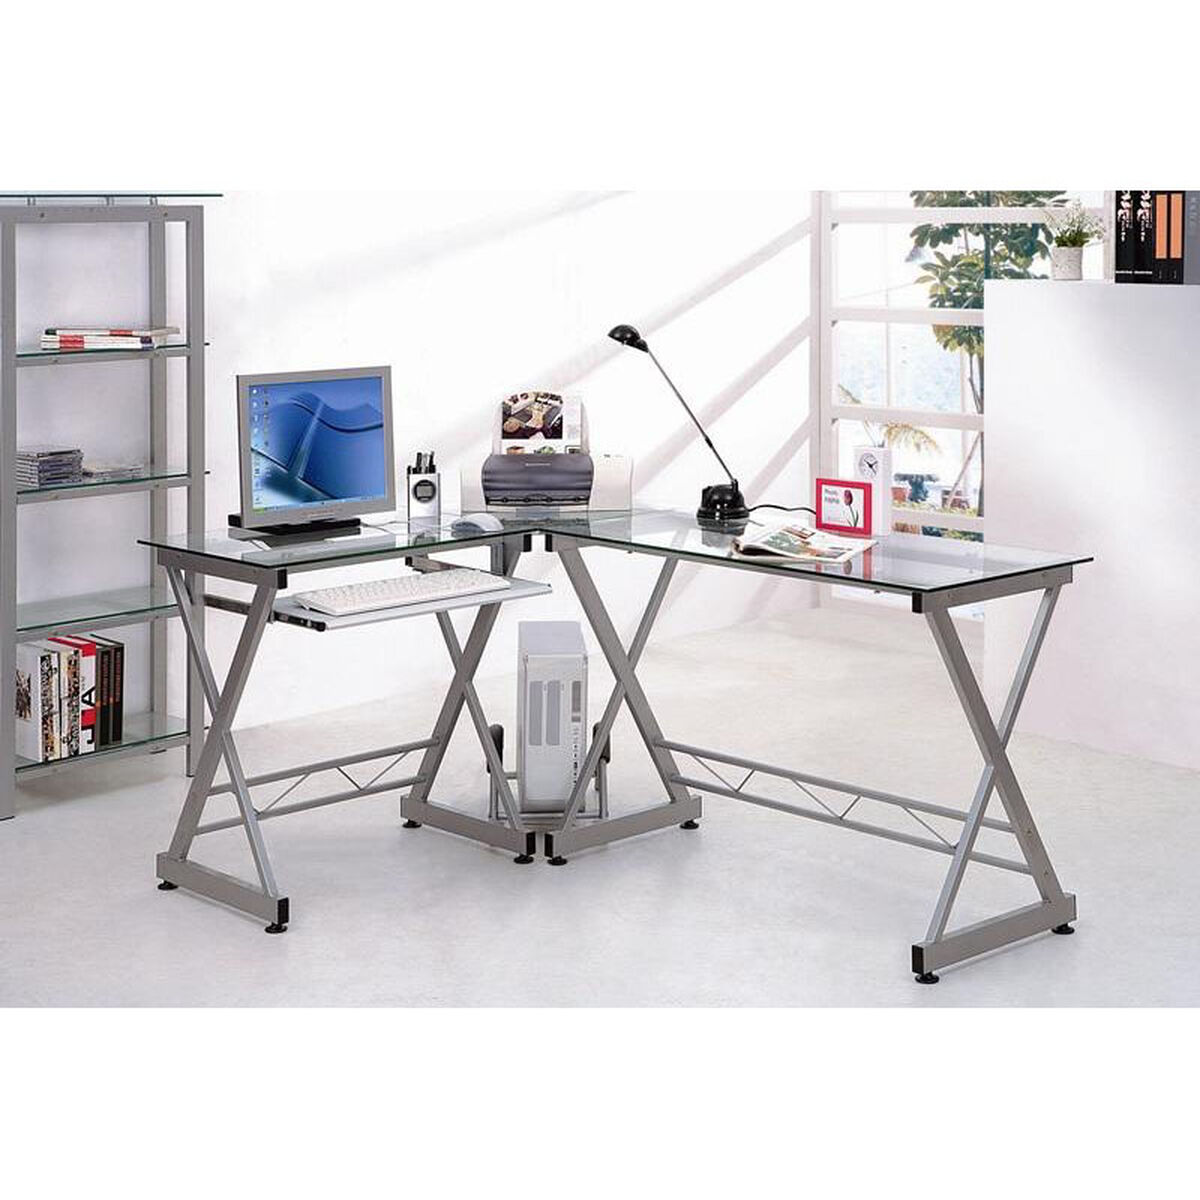 Images. Techni Mobili L-shaped Clear Glass Computer Desk